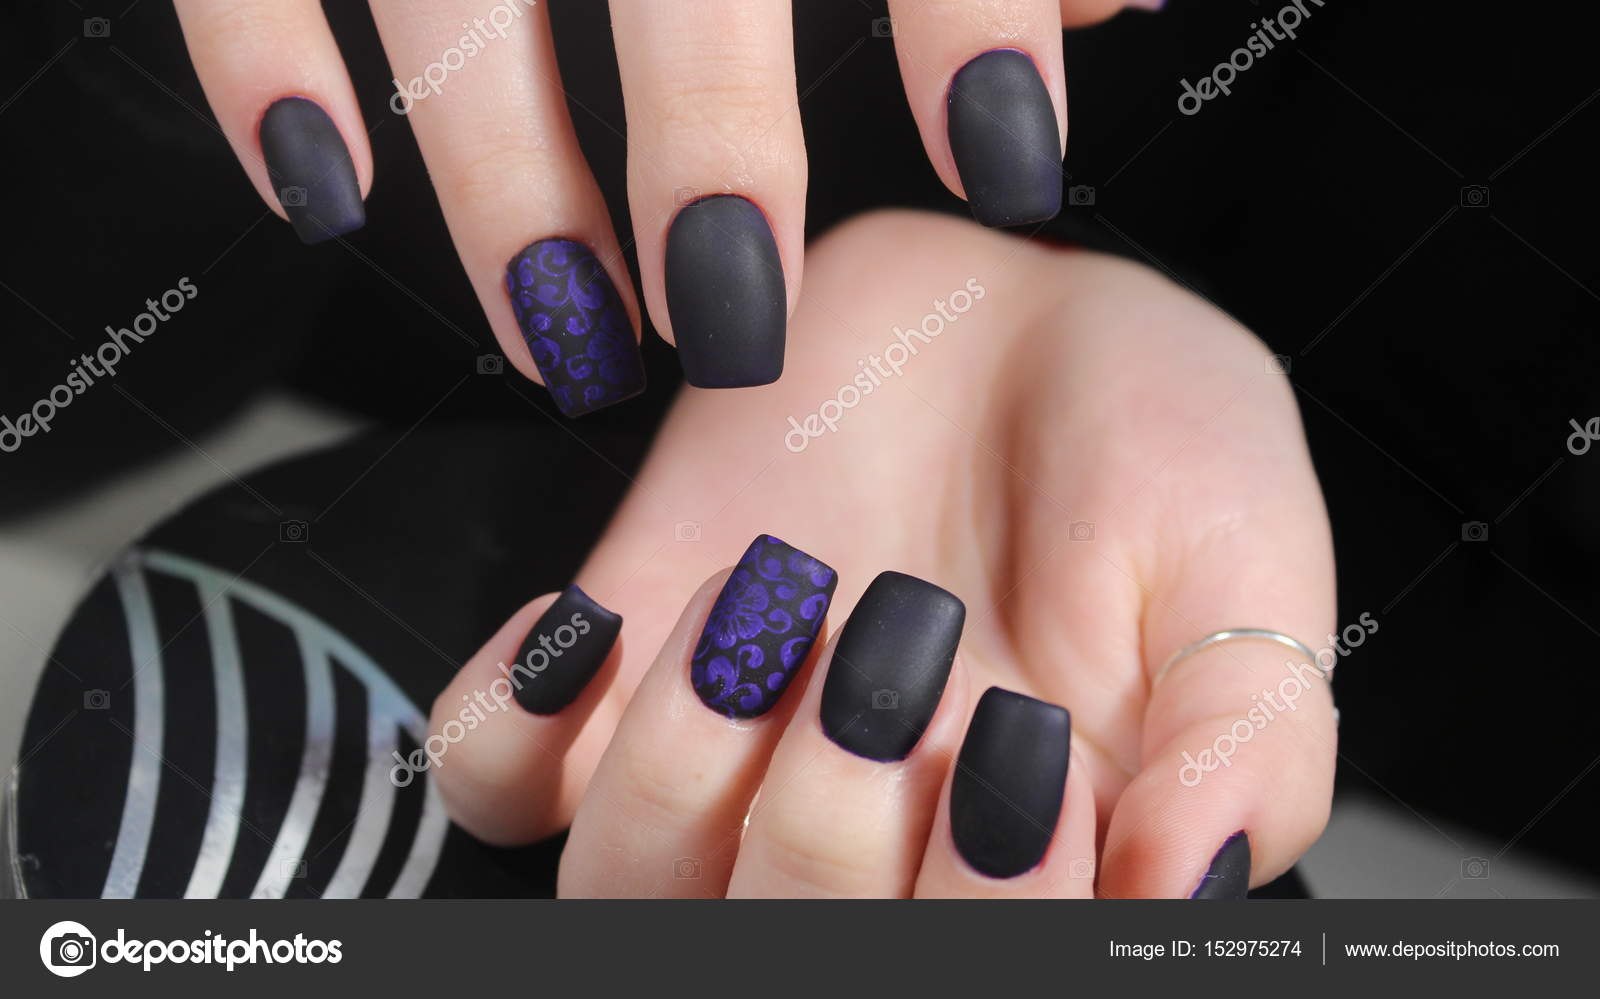 Design Of Manicure Matt Black And Blue Nails Stock Photo C Smirmaxstock 152975274